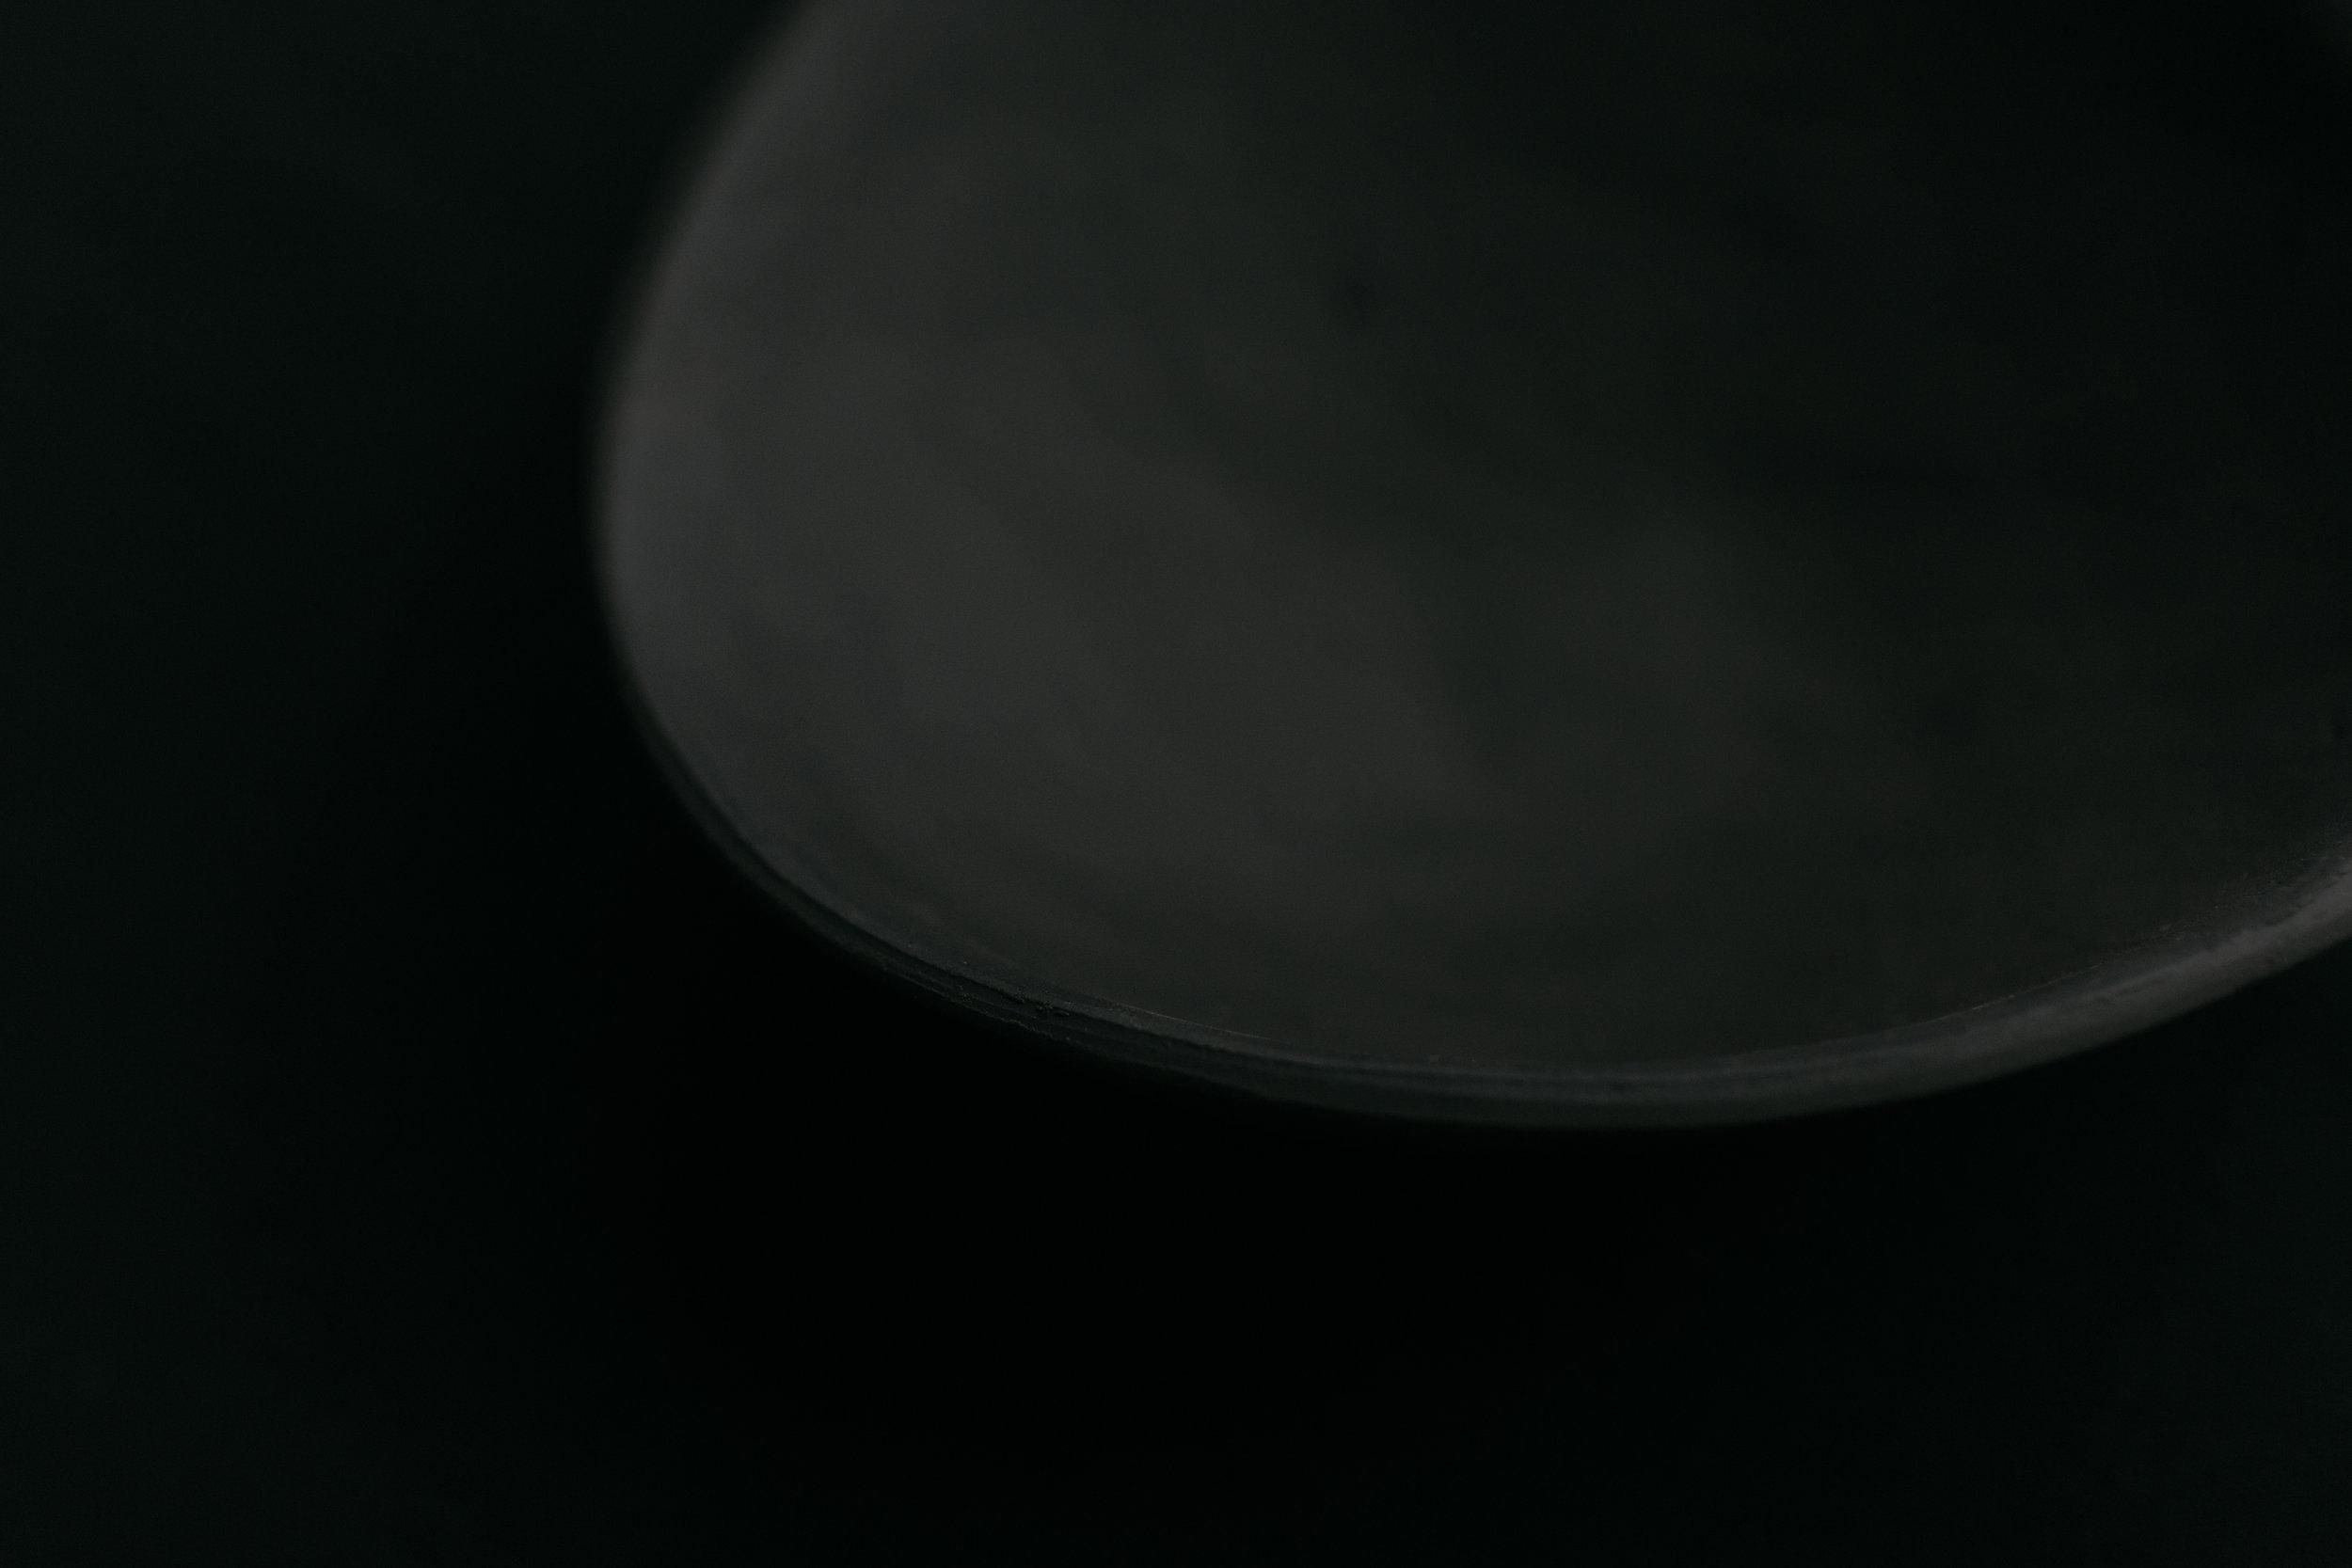 CivilStonware-EditOne-Anna-Howard-54.jpg